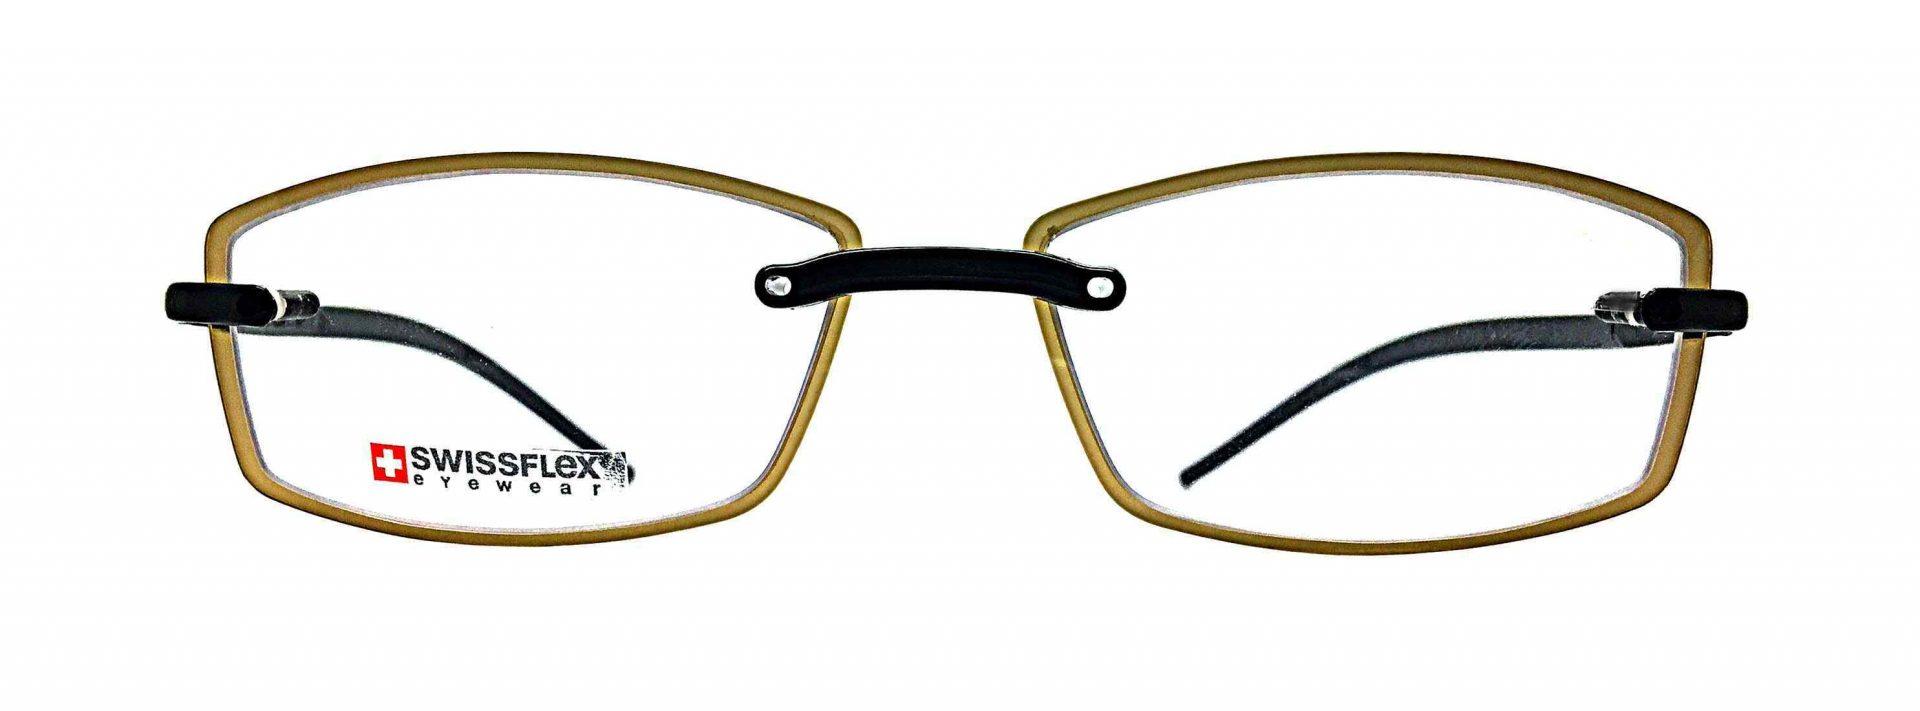 SwissFlex spectacles: SwissFlex Contur 105 54 1 2970x1100